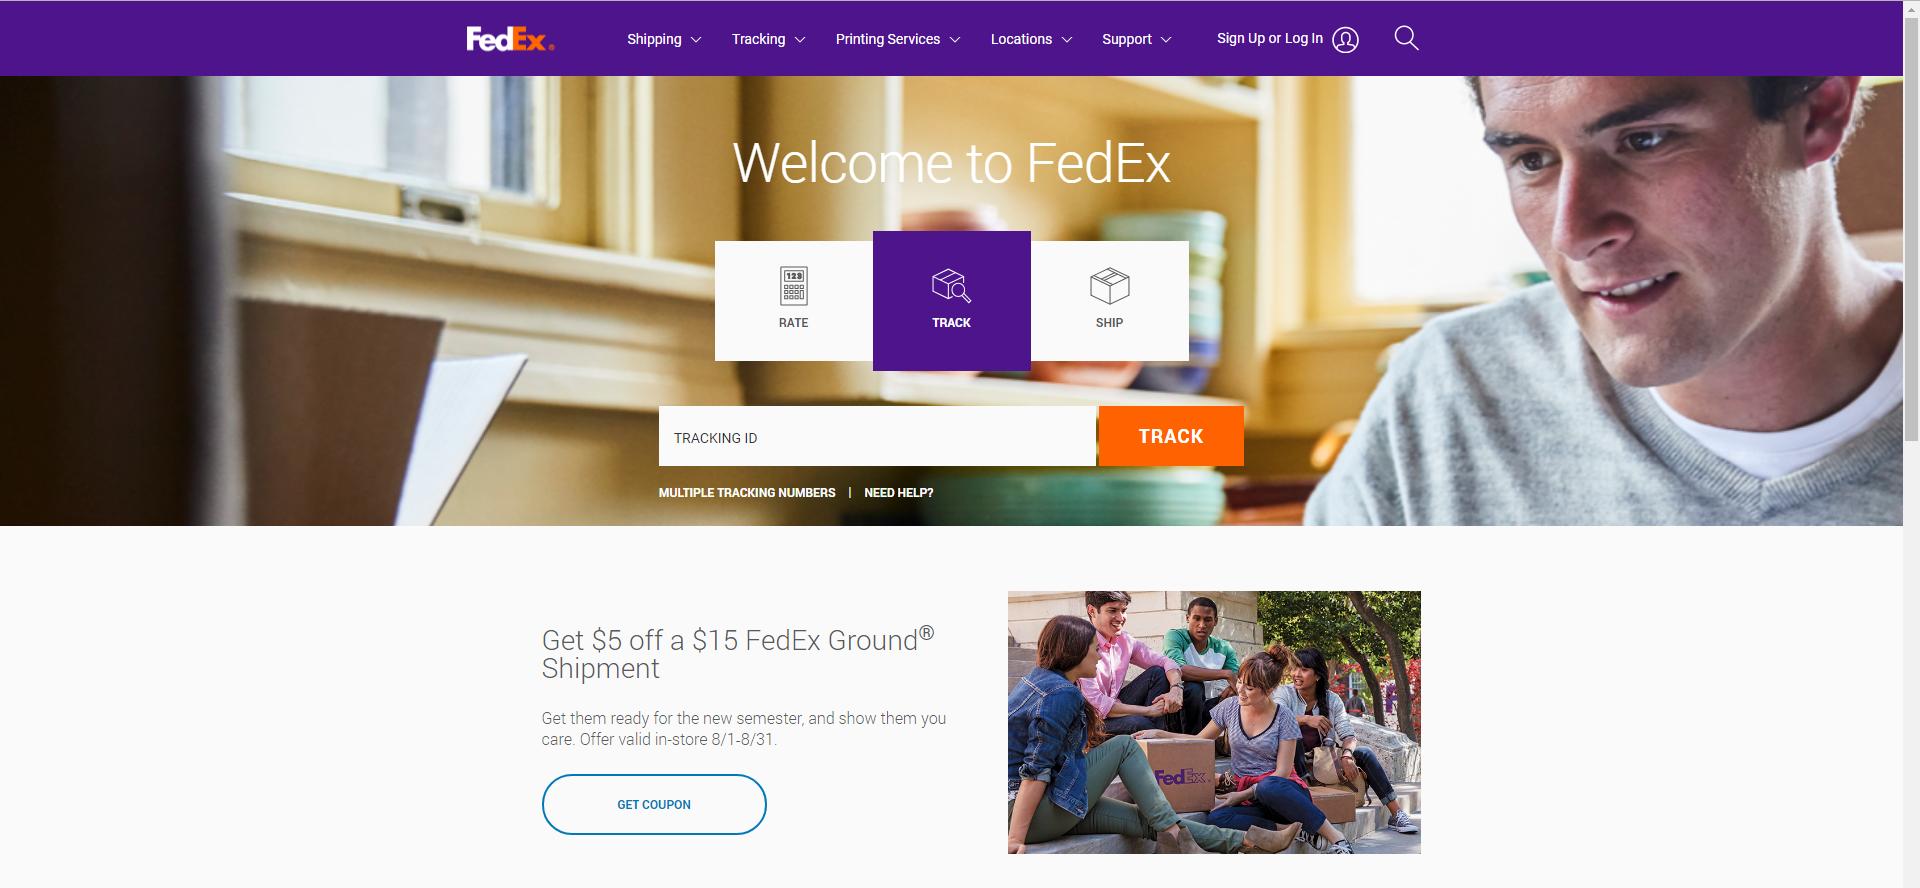 FedEx Homepage-121188-edited